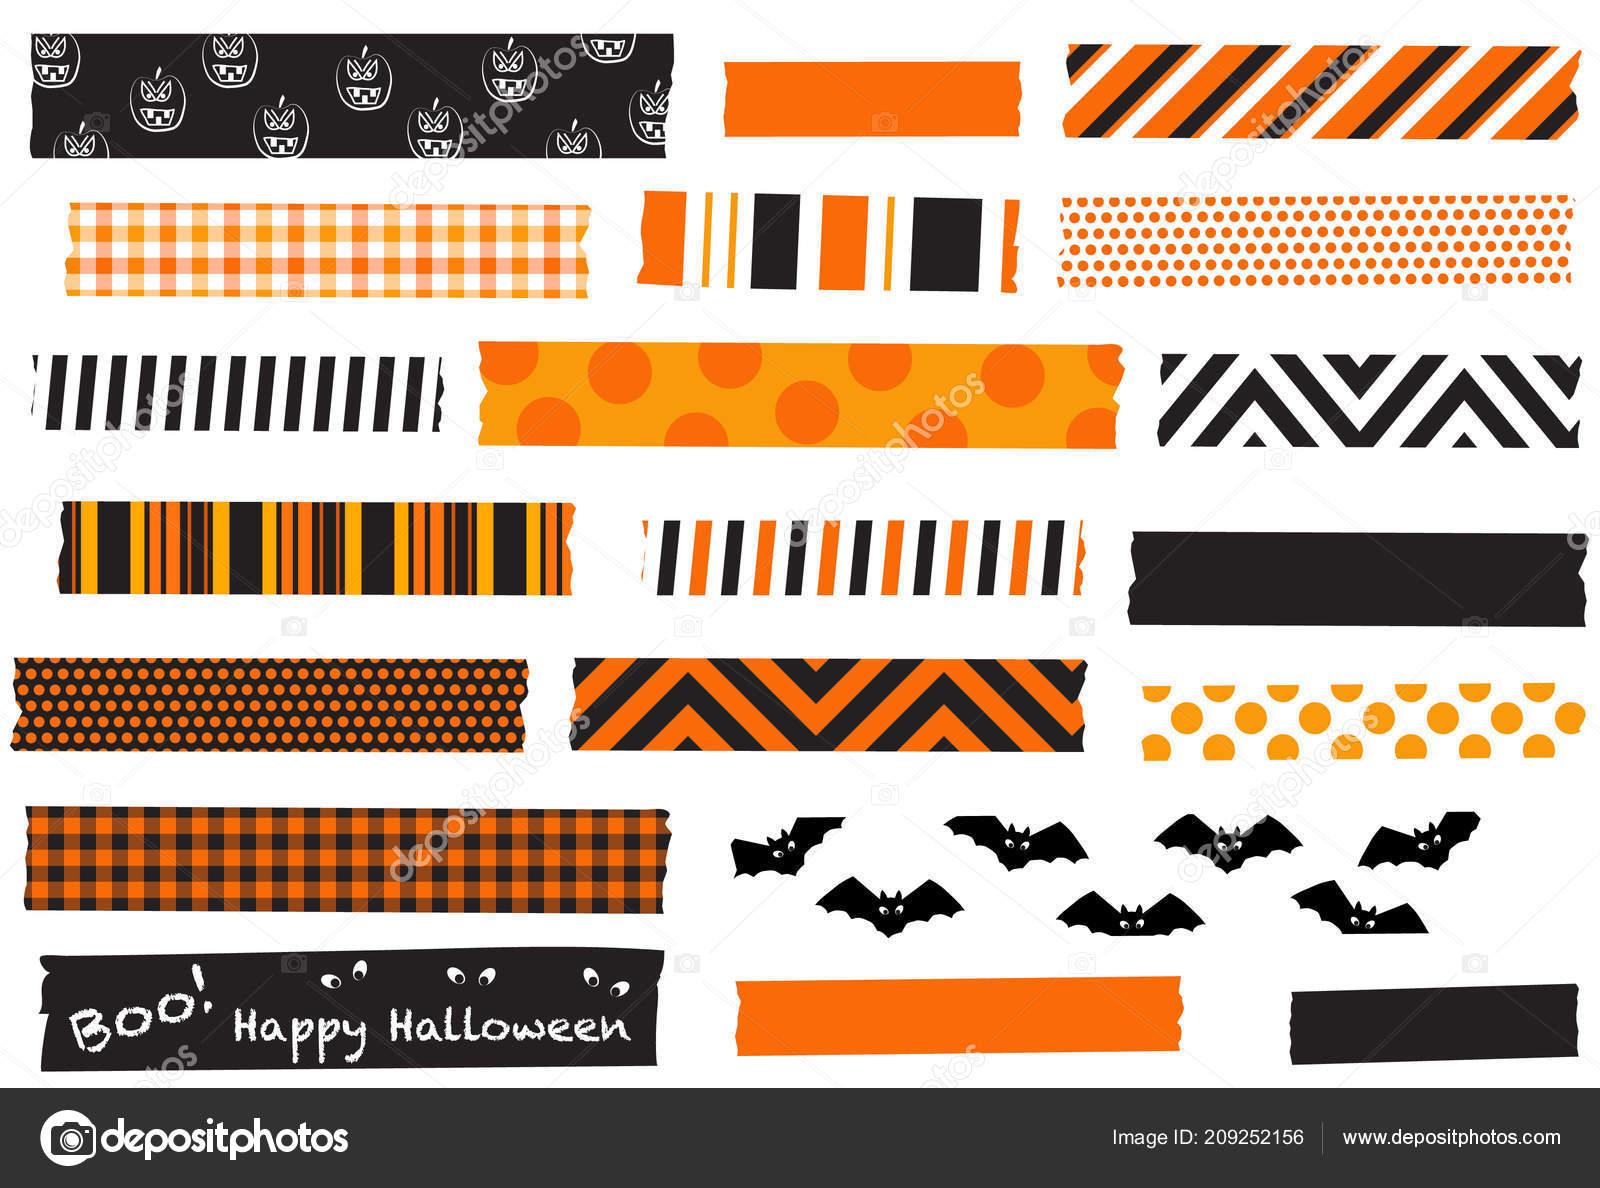 Halloween Collection Washi Tape Five Orange Black Tapes